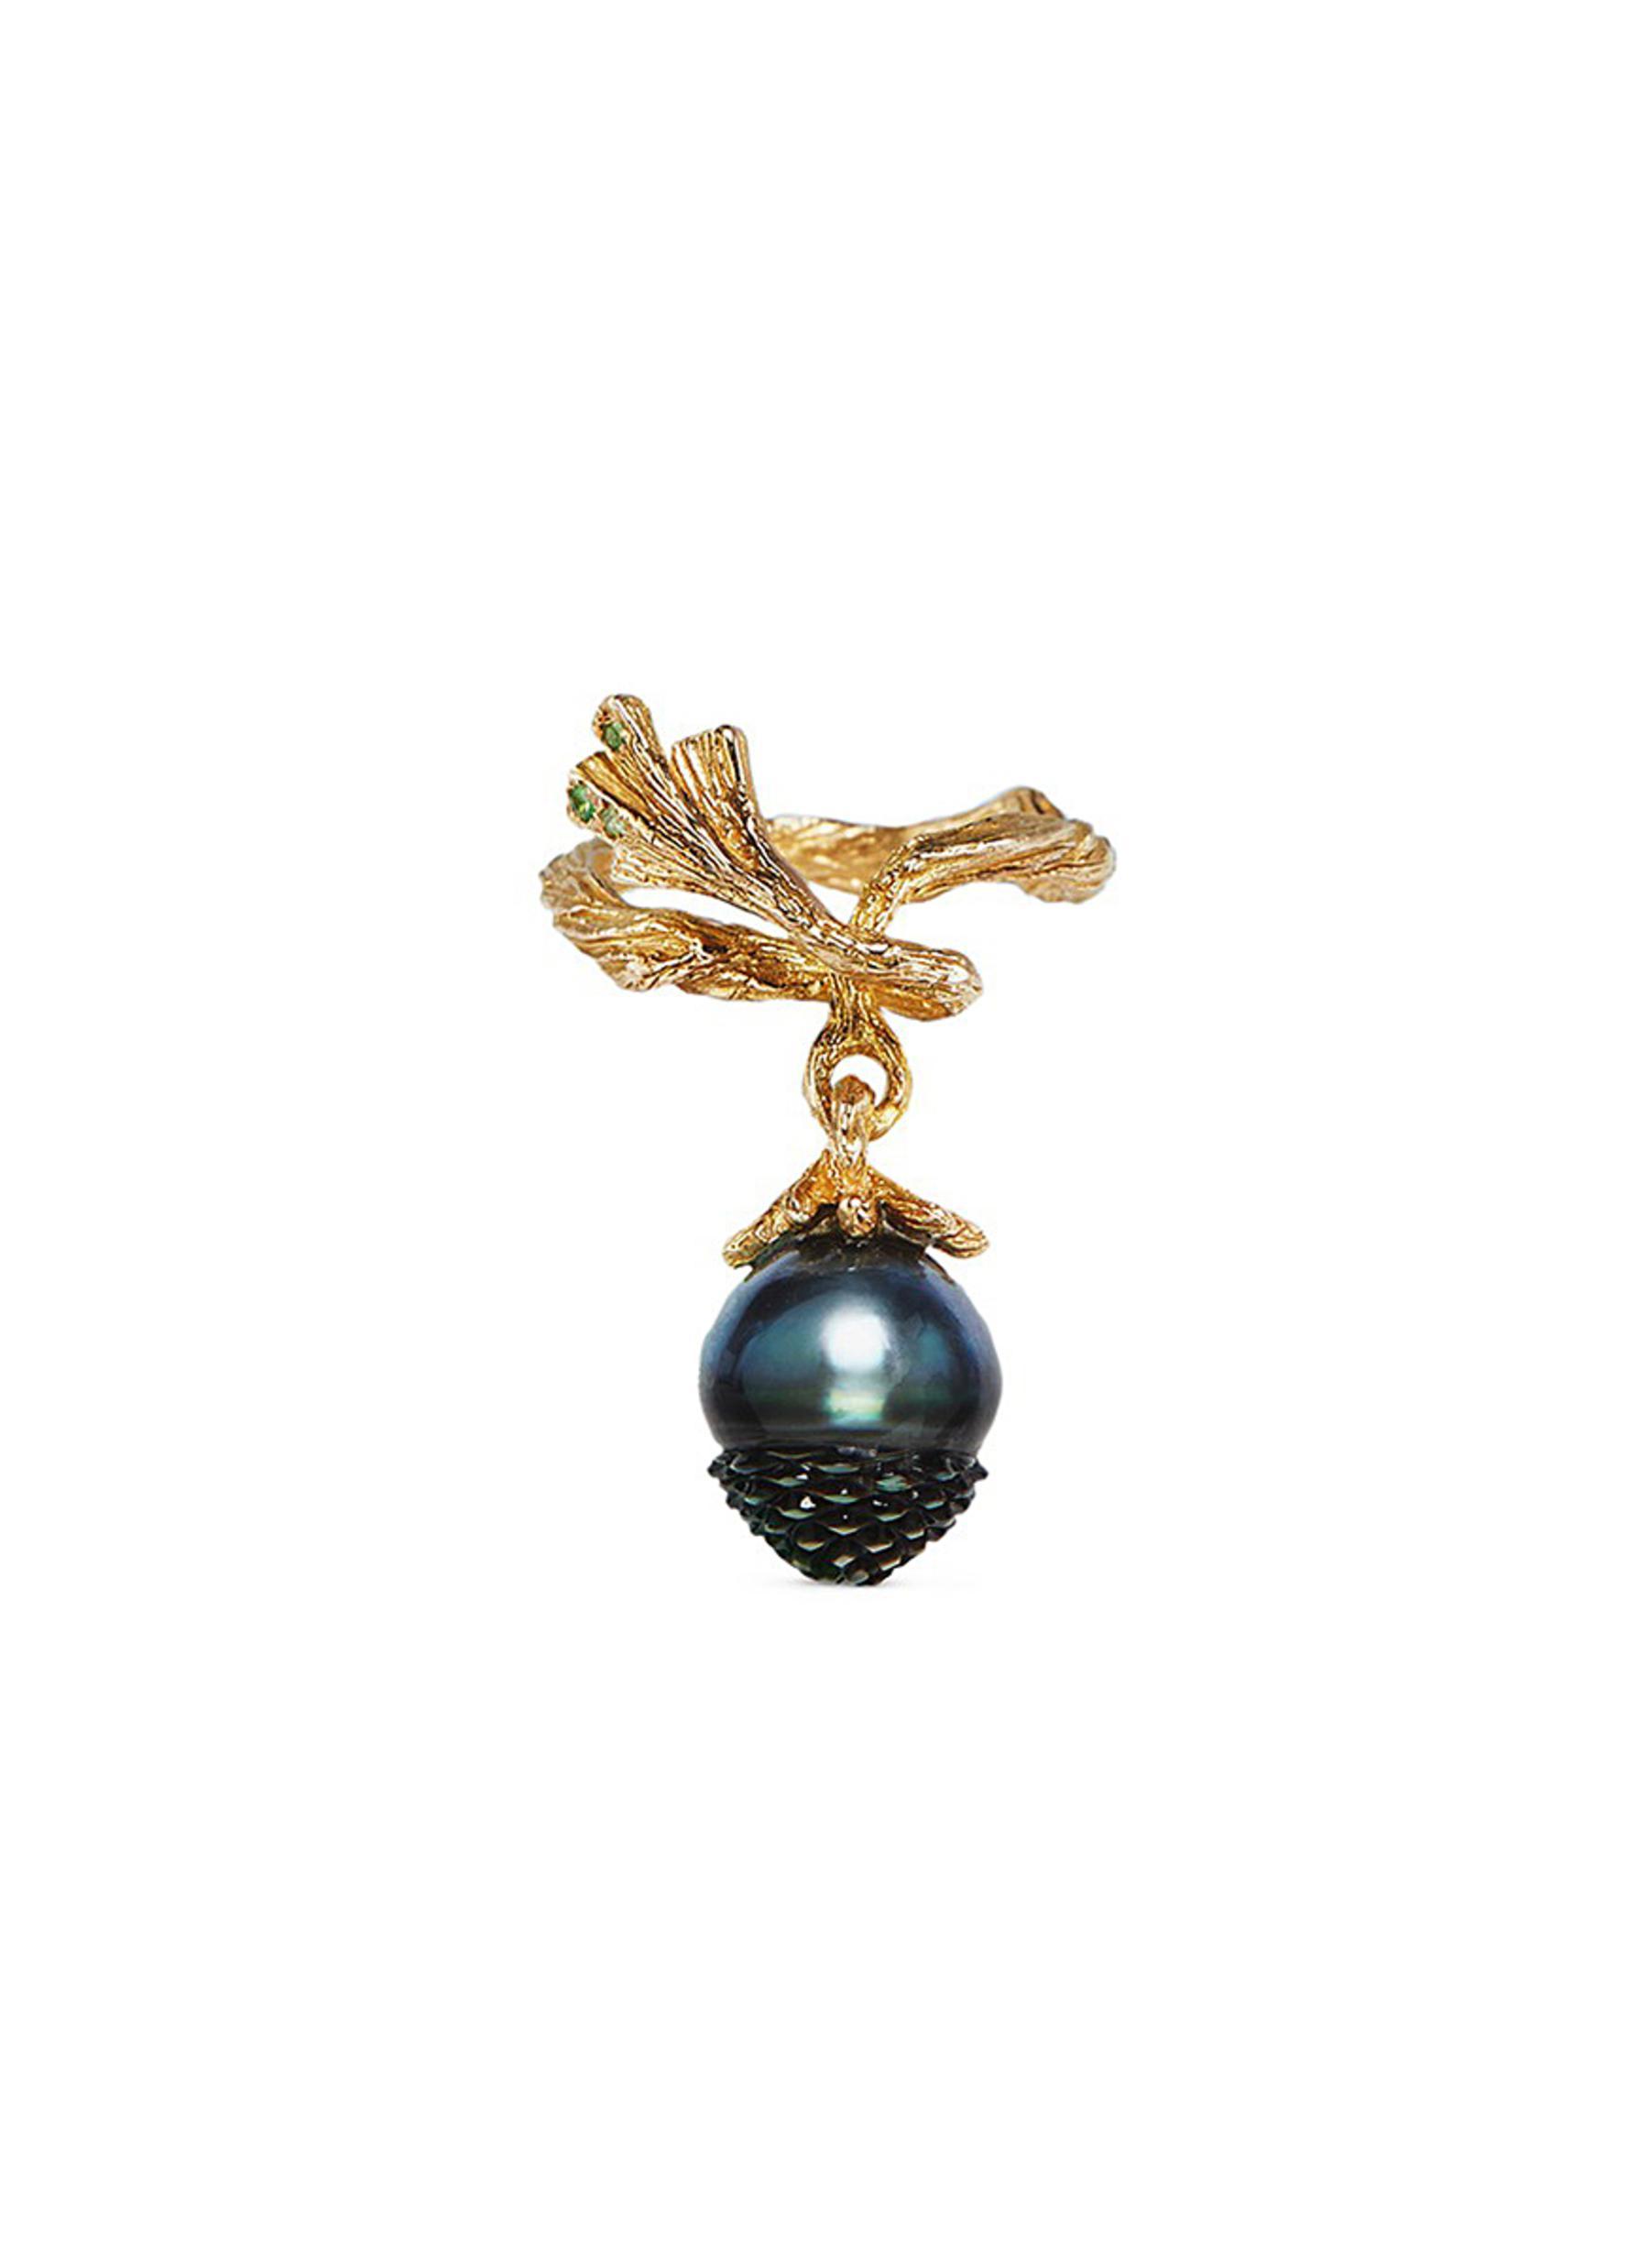 Pinecone tsavorite pearl 18k gold ring by Heting